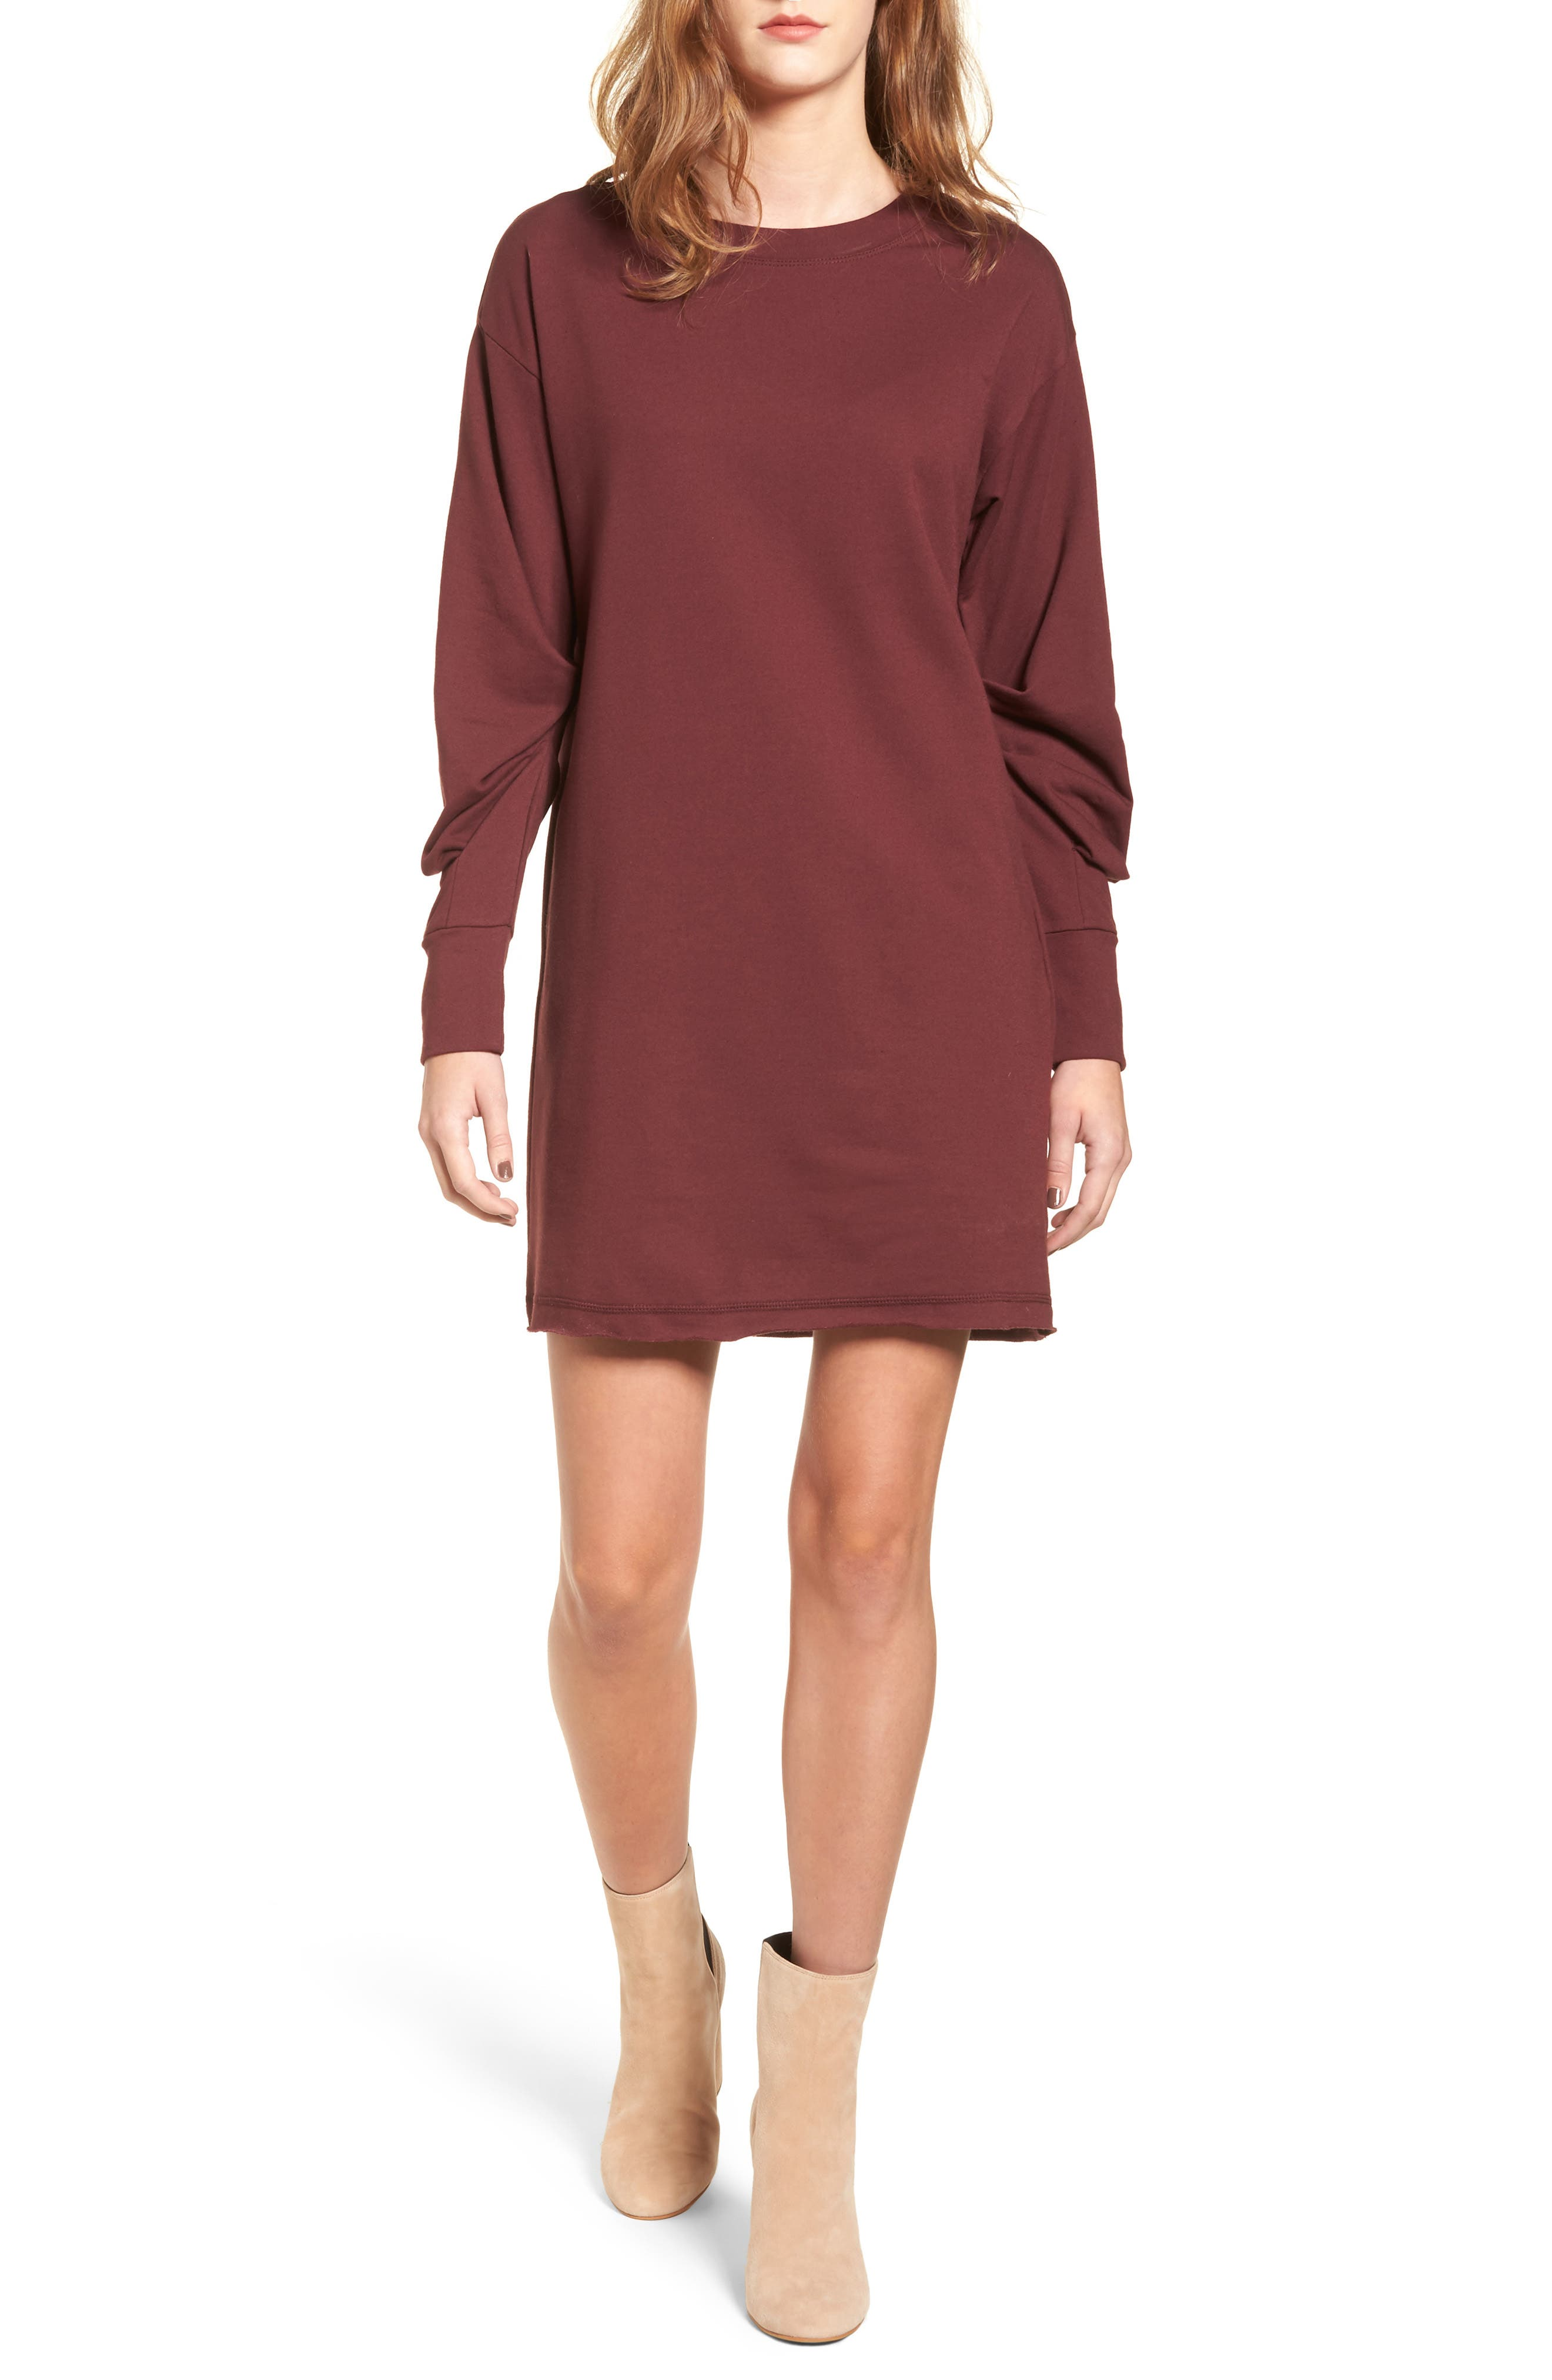 Main Image - Socialite Gathered Sleeve Sweatshirt Dress